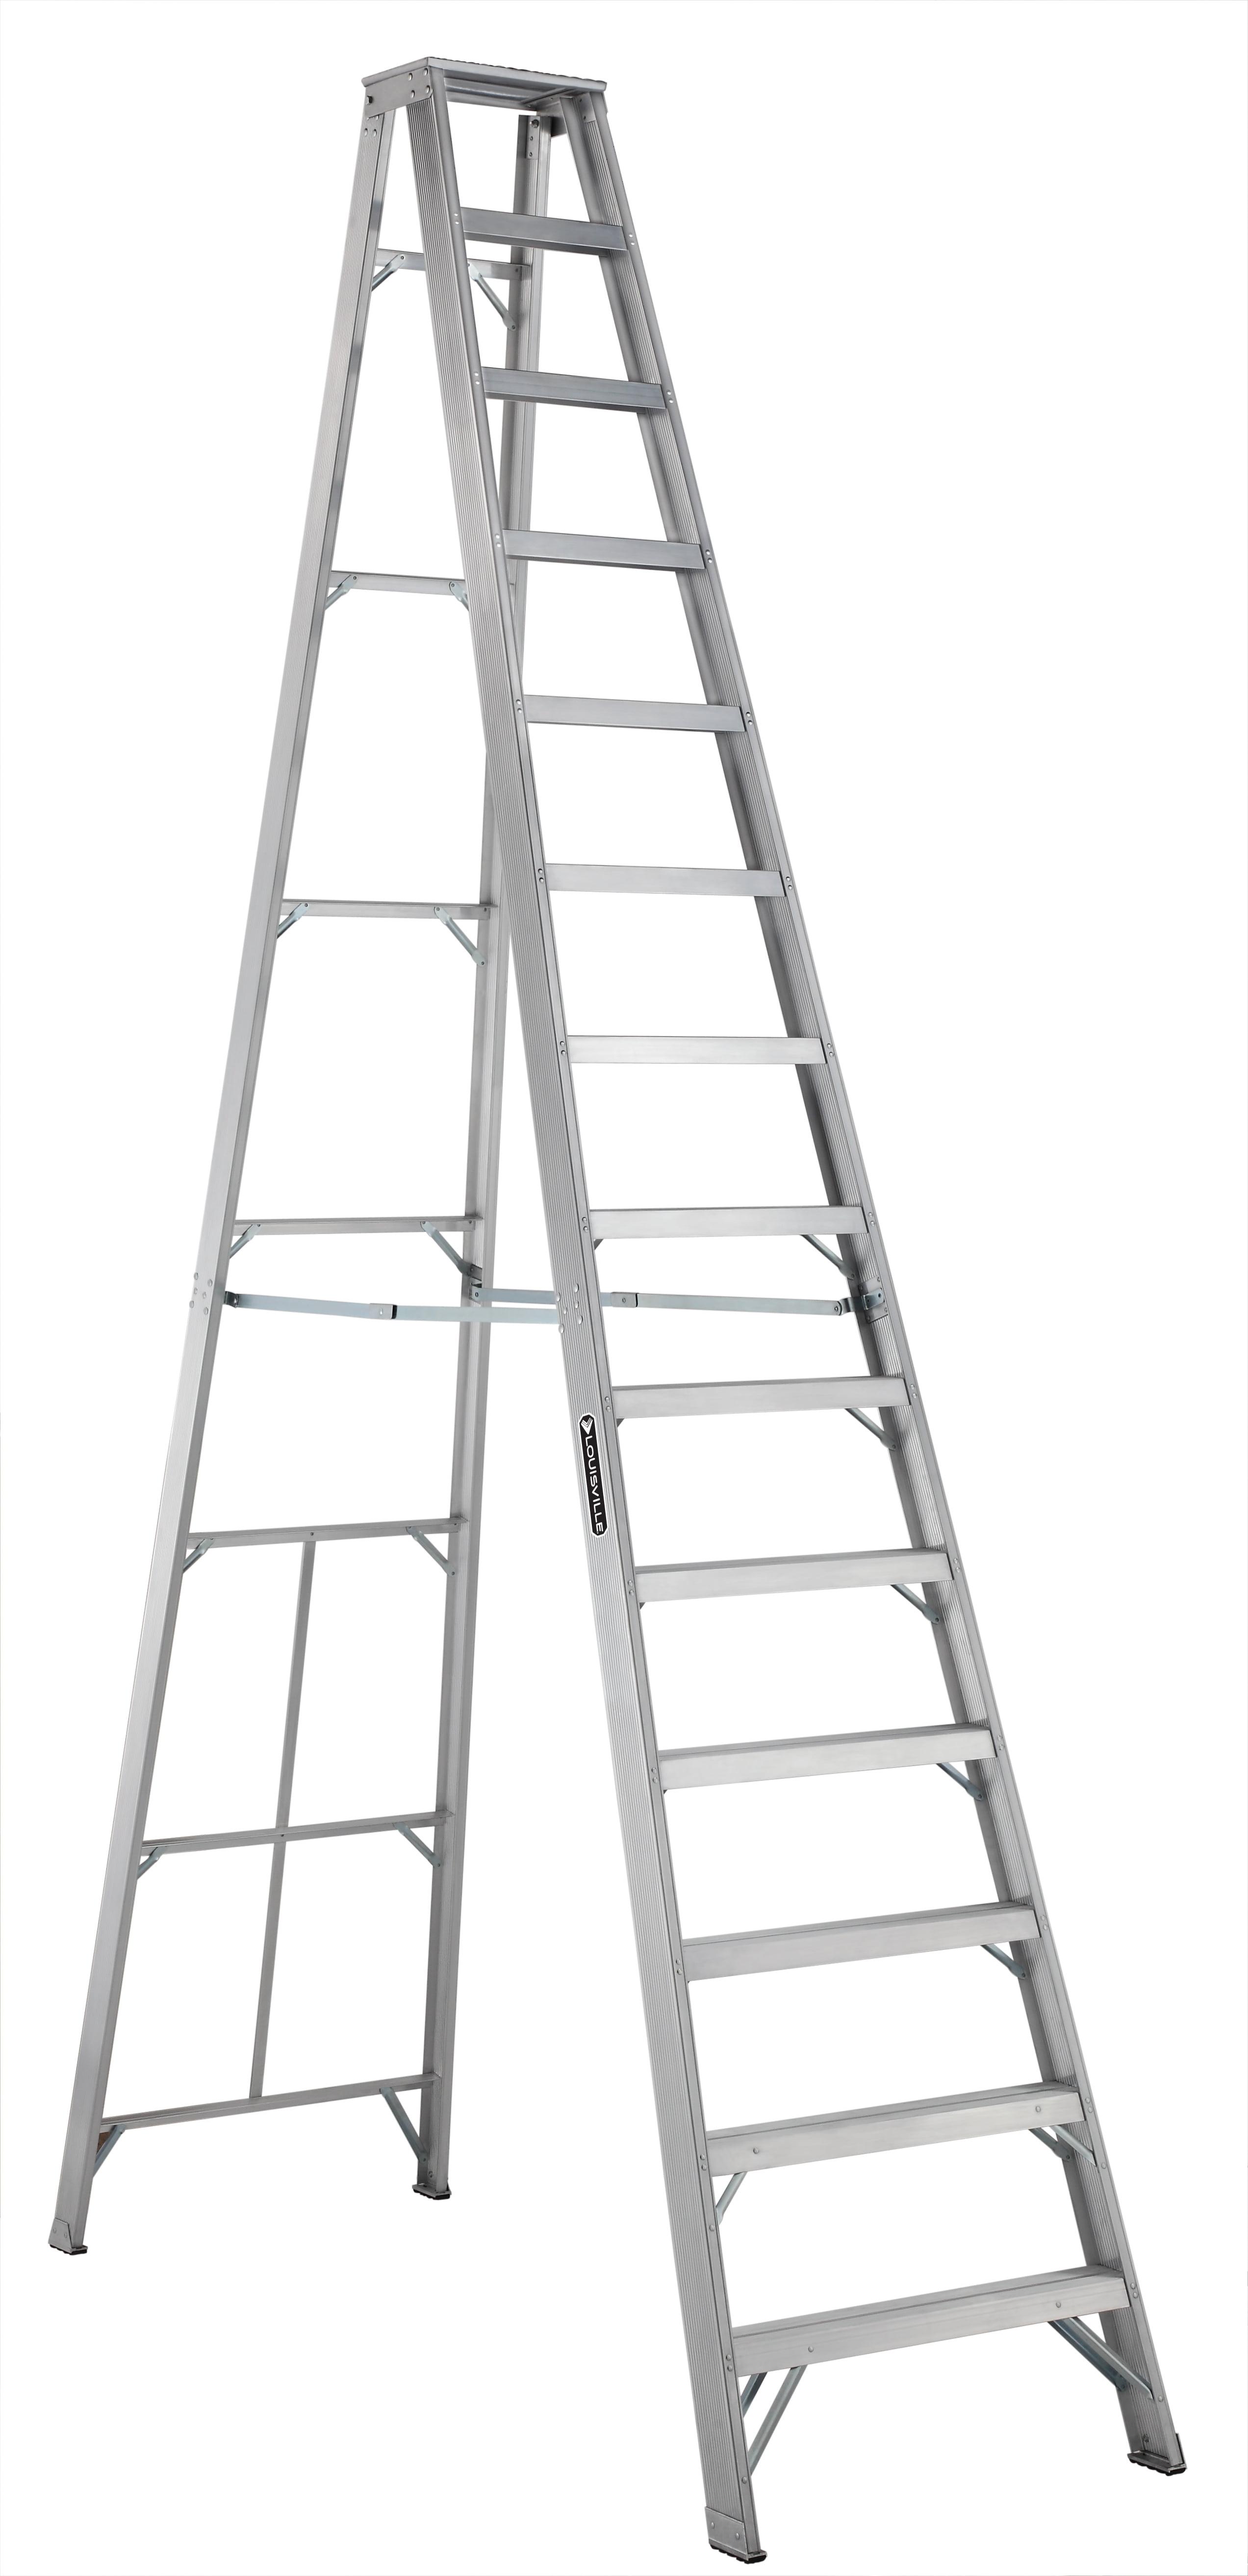 Louisville Ladder As1014 14 Ft Aluminum Step Ladder Type Ia 300 Lbs Load